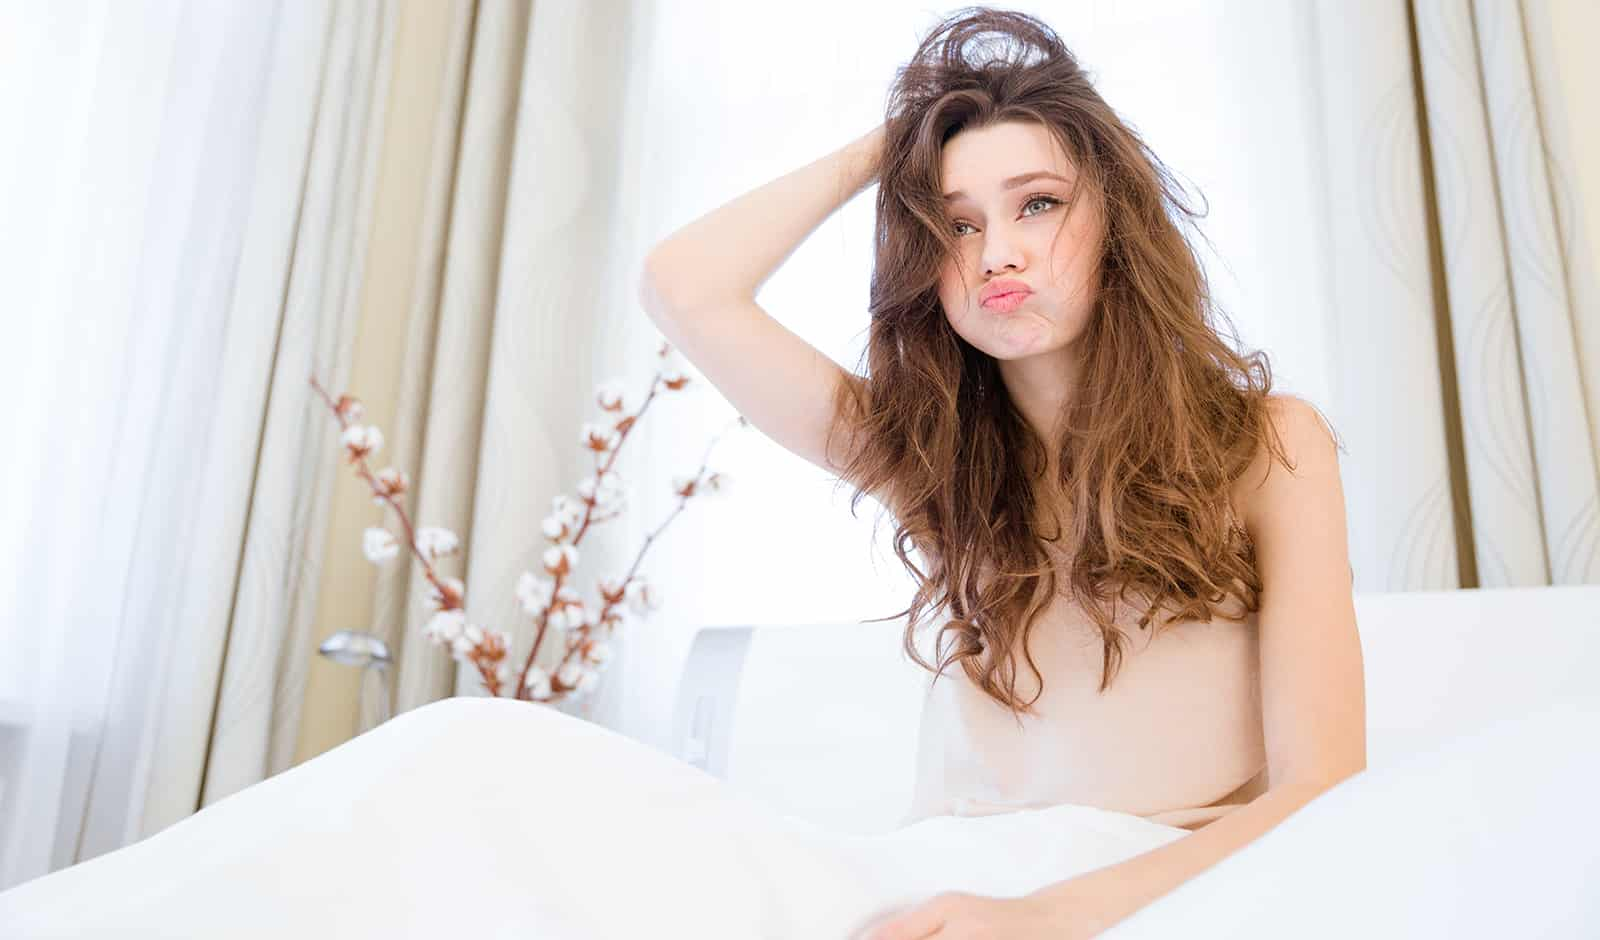 harmless-habits-that-lead-to-sleepless-nights-main-image